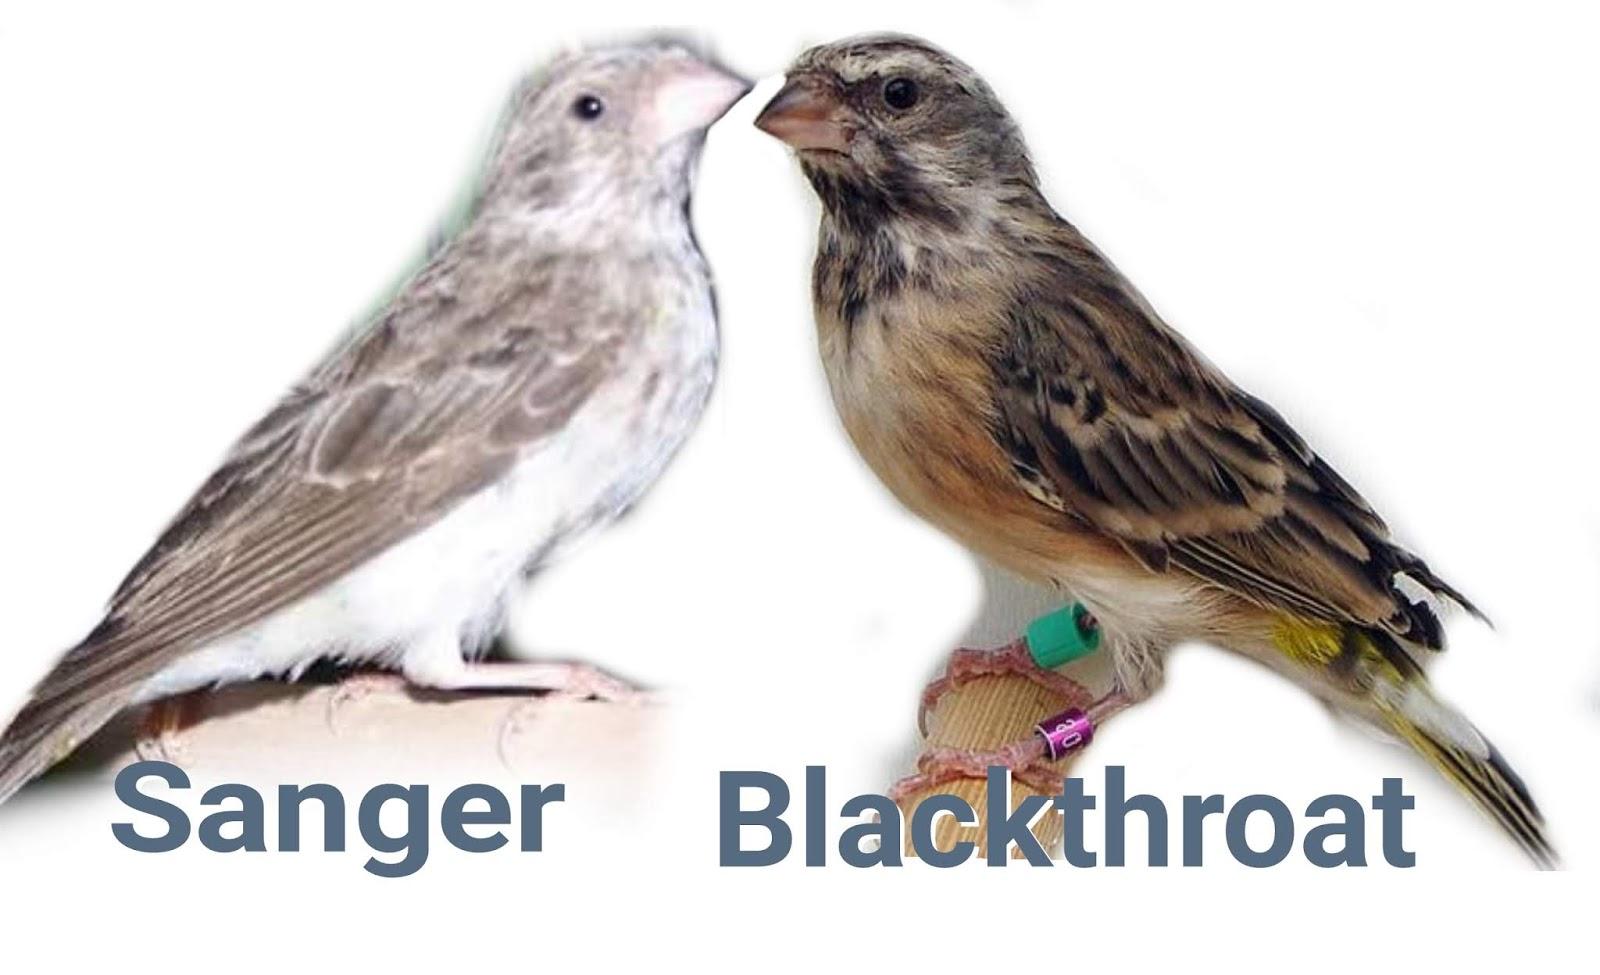 Perbedaan Blackthroat Dan Sanger Gaco Gacor